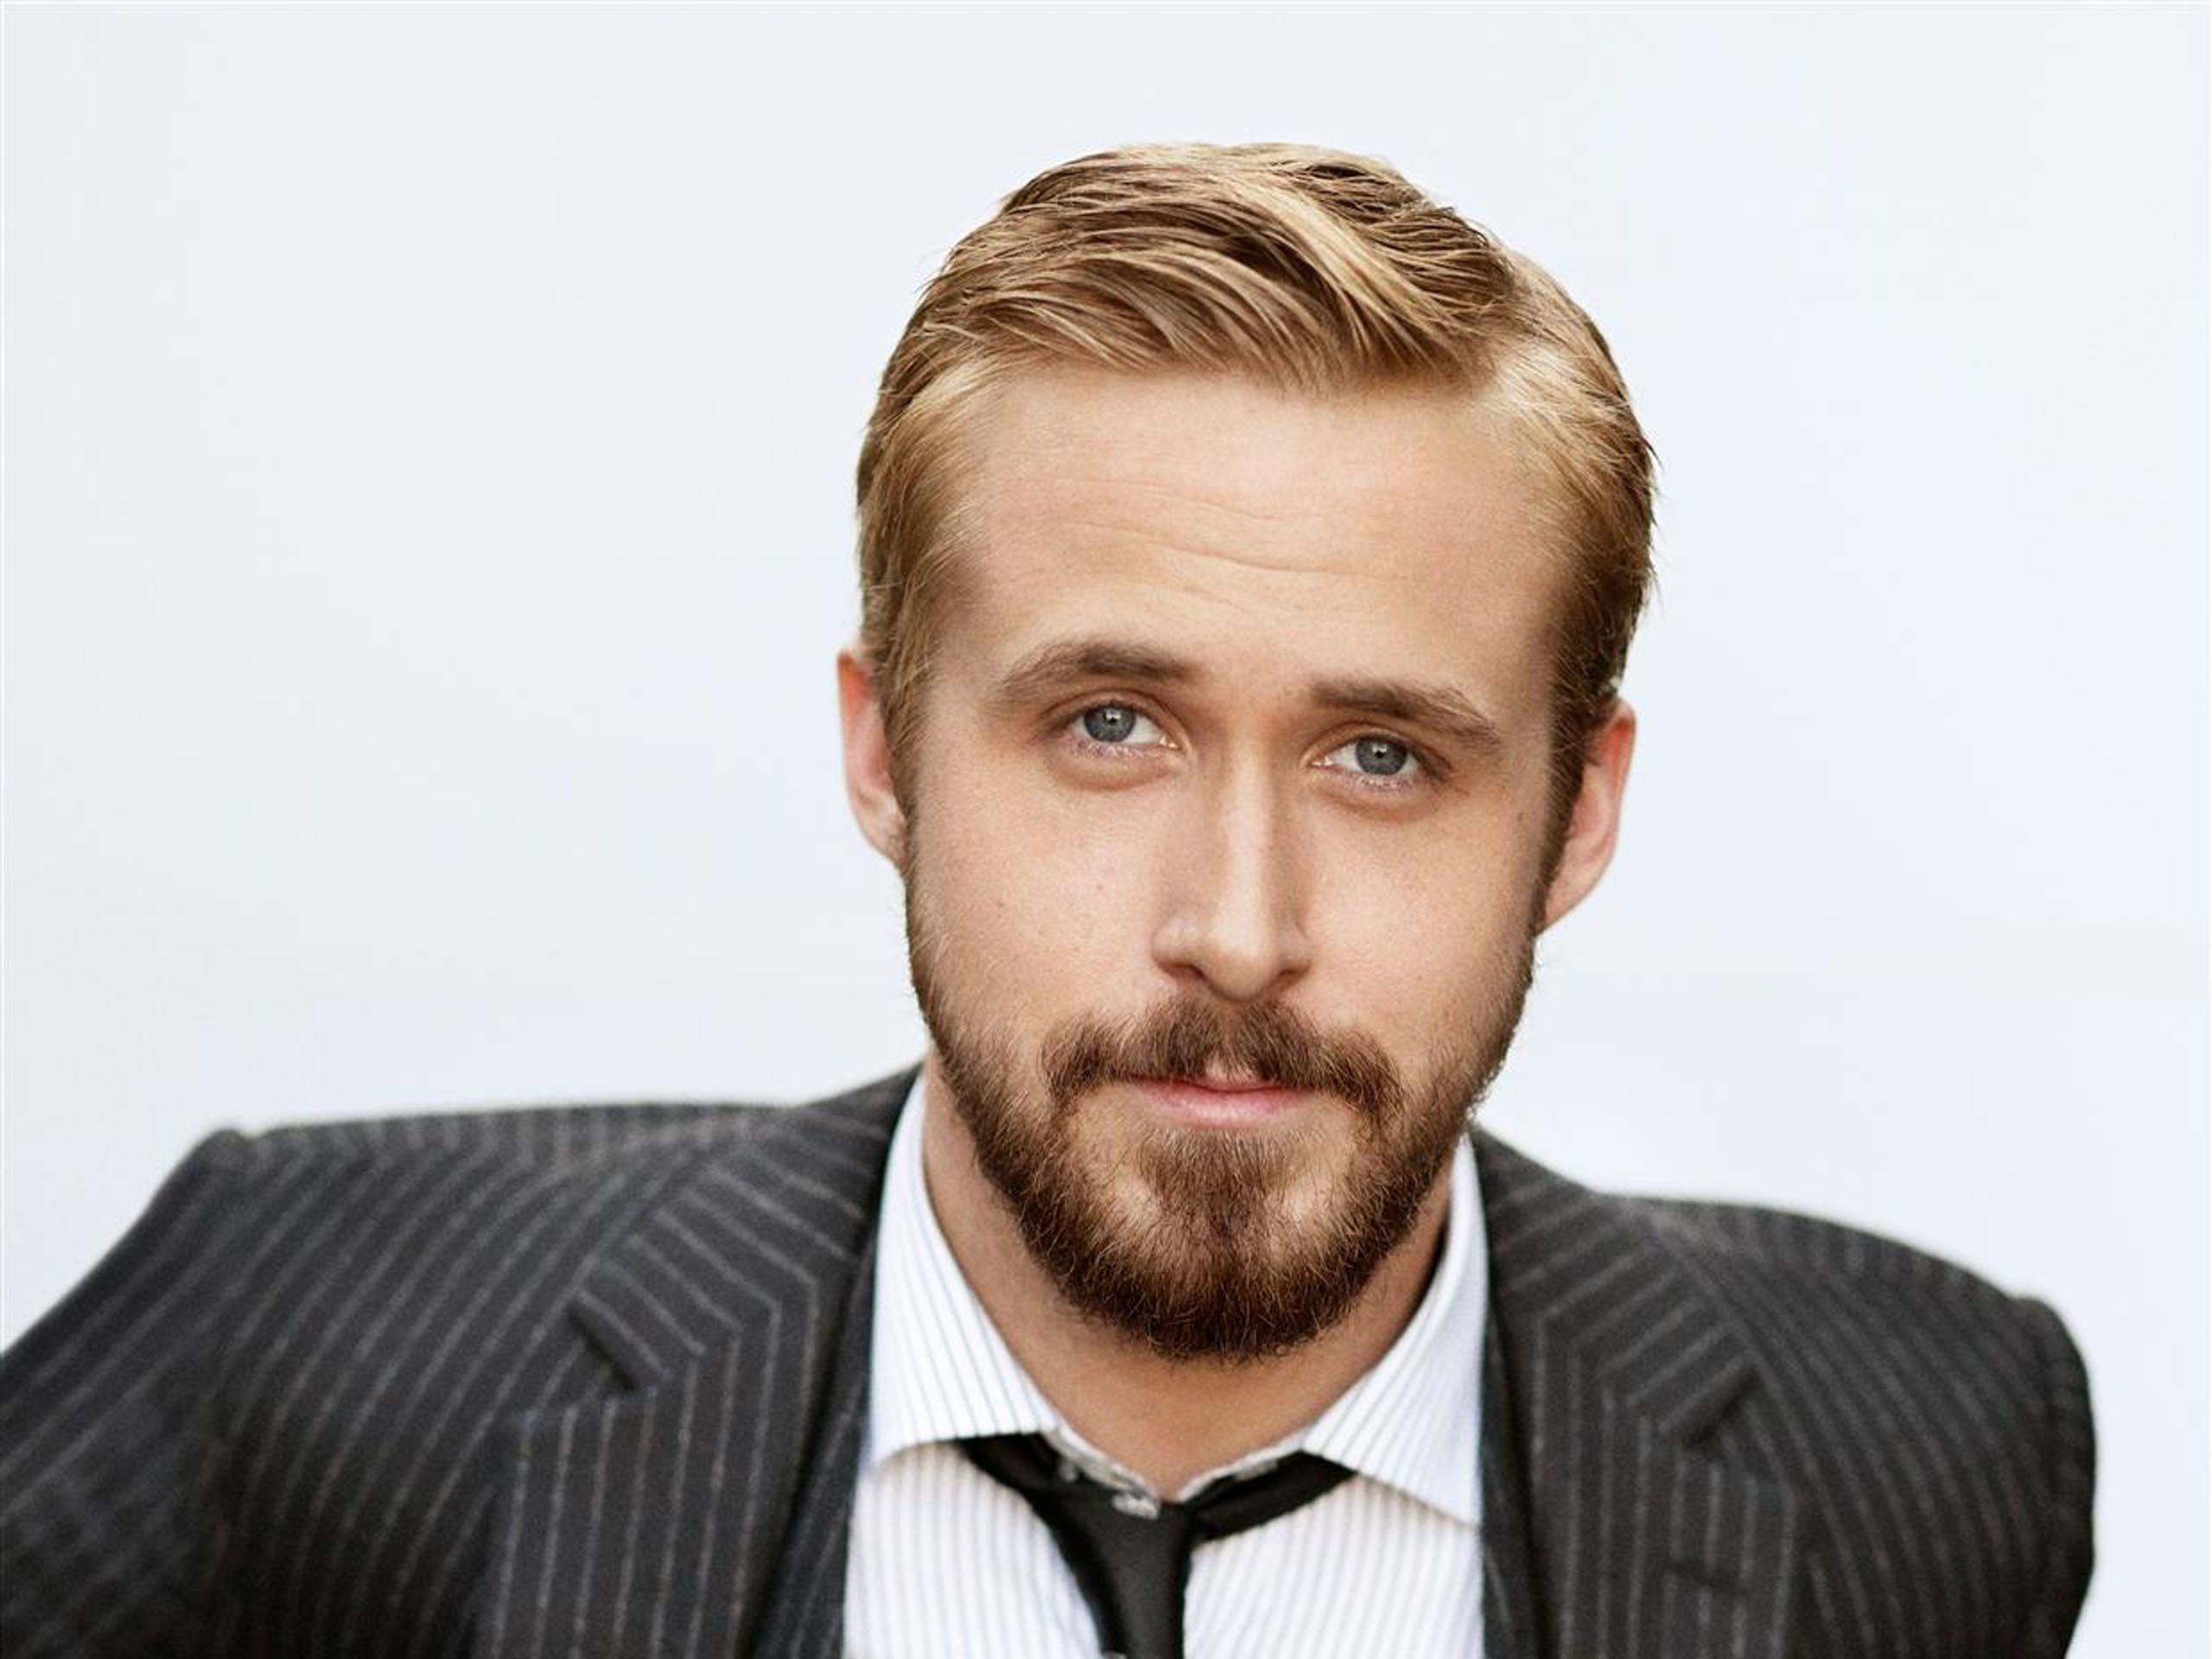 Ryan Gosling mangia i cereali